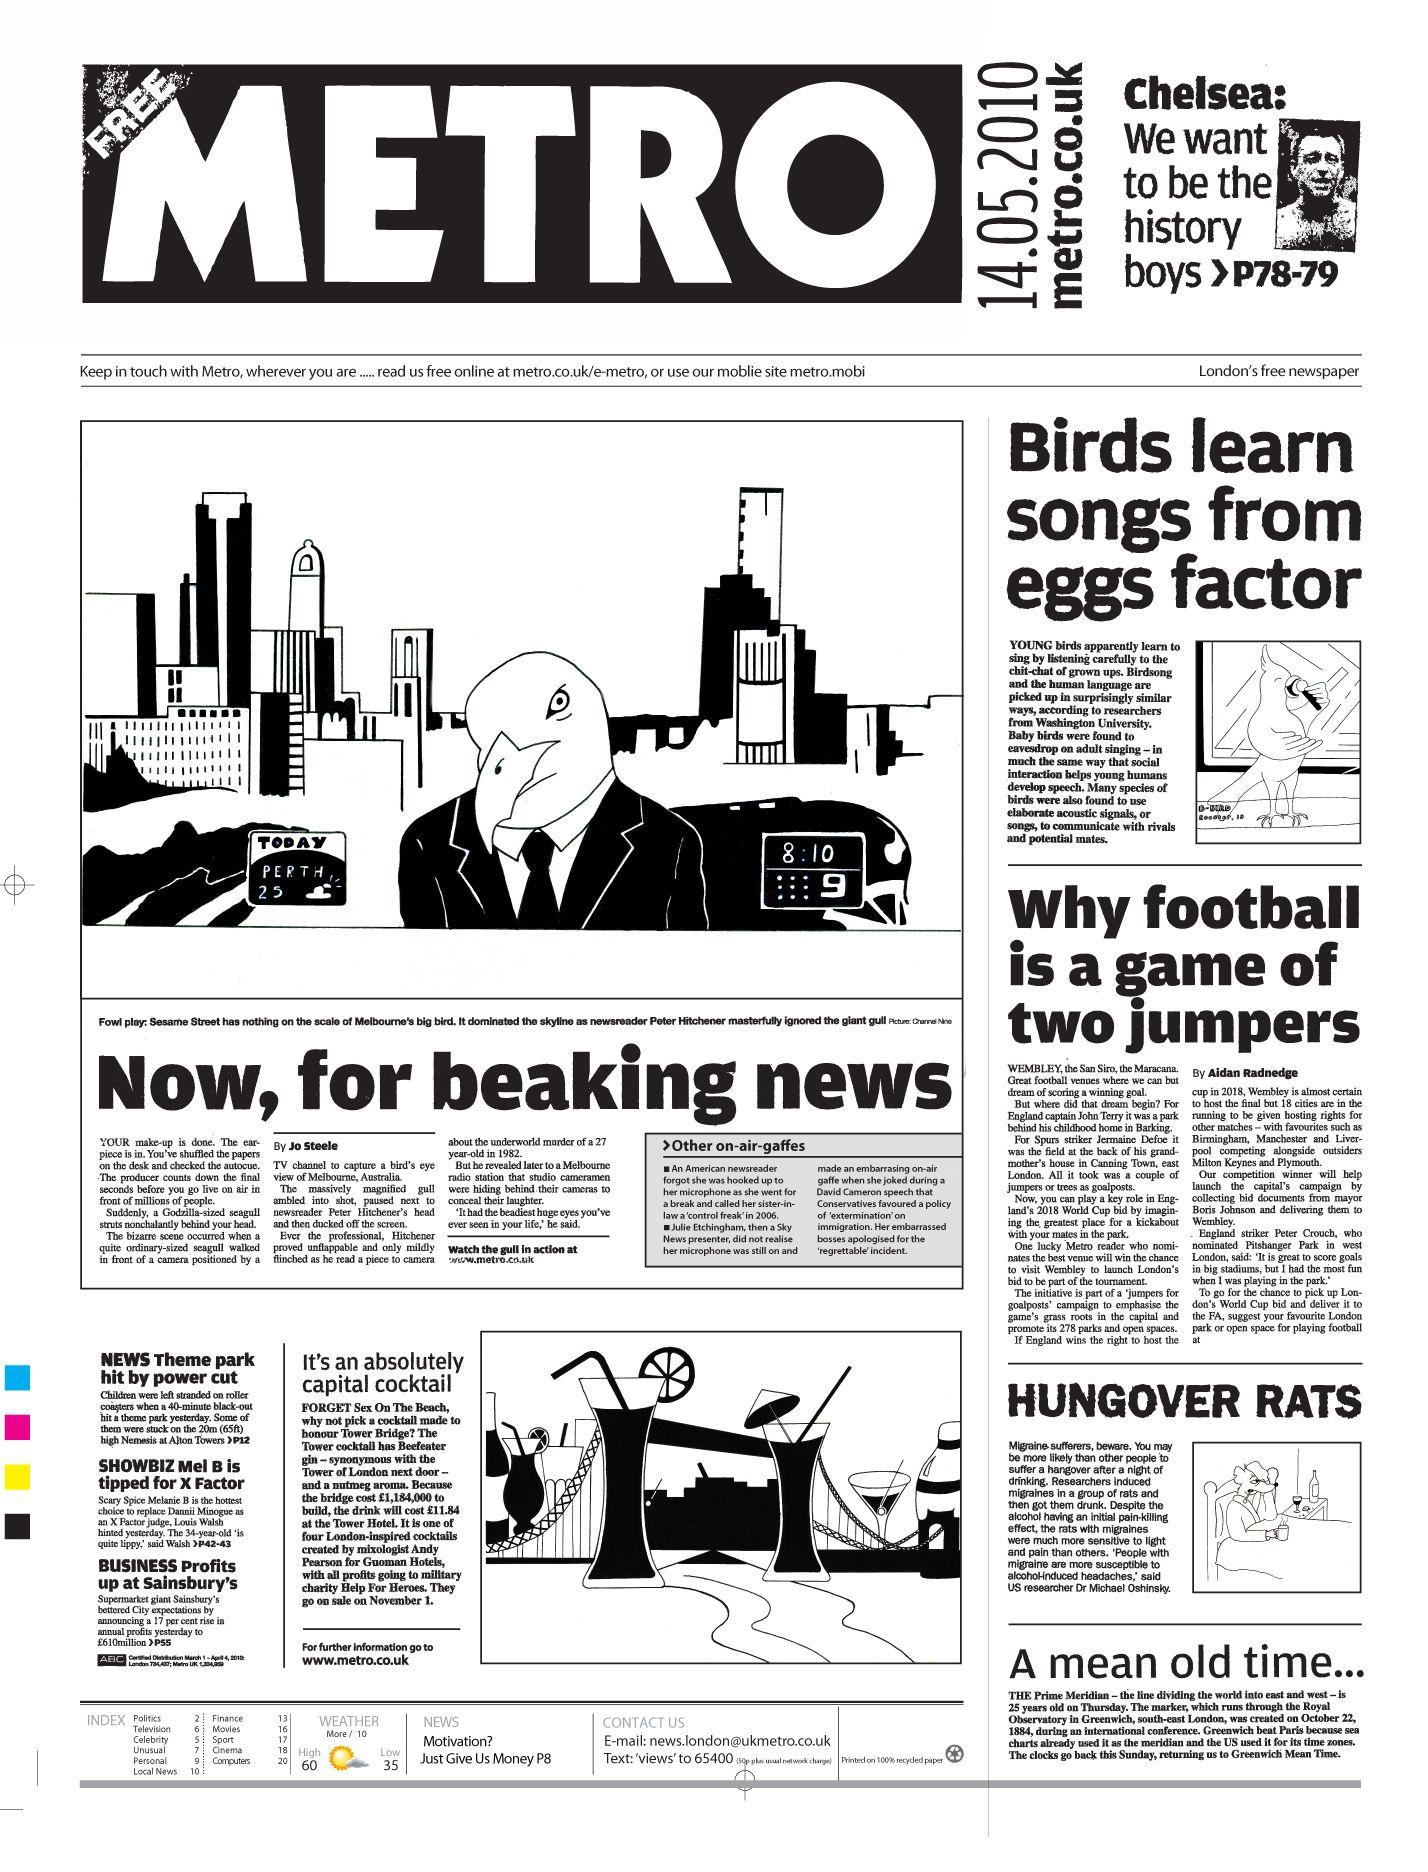 newspaper template illustrator - Muck.greenidesign.co